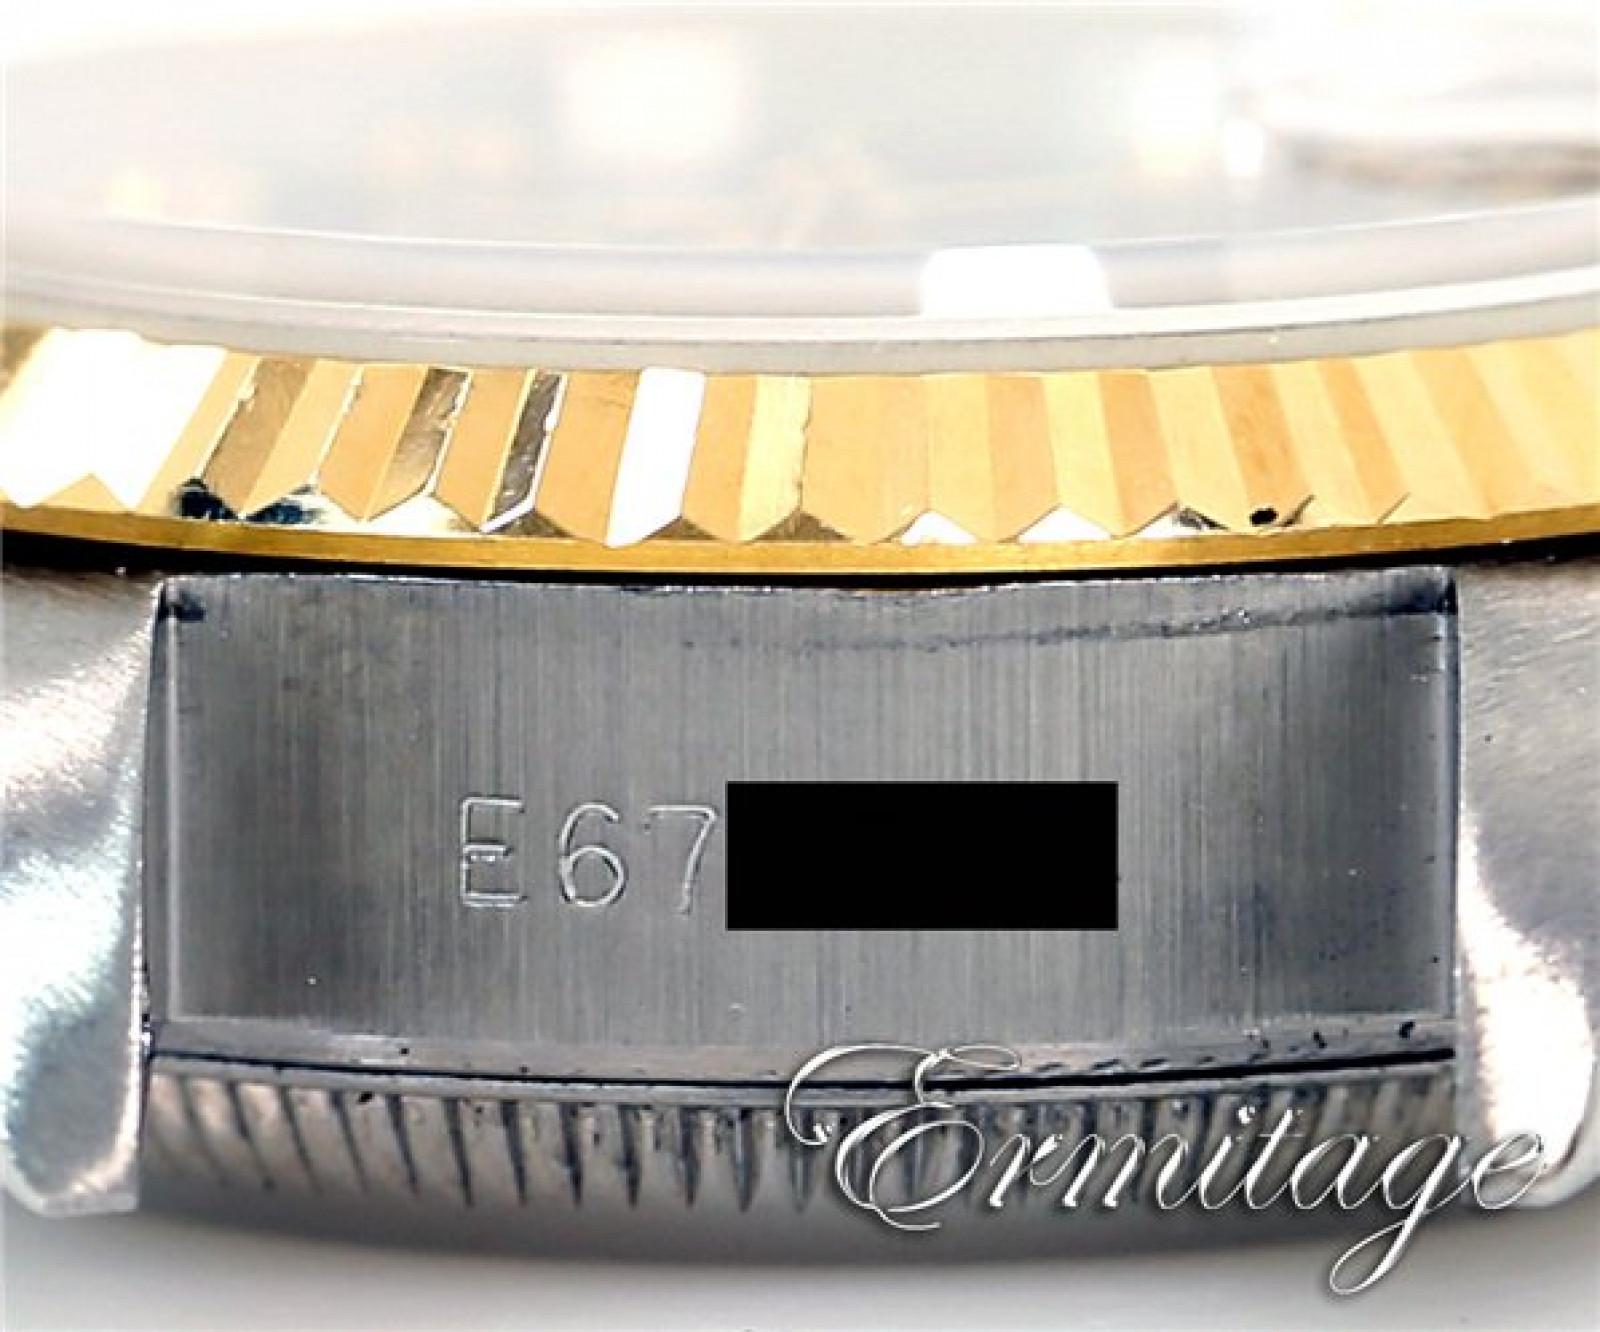 Rolex Datejust 69173 Gold & Steel with Diamonds